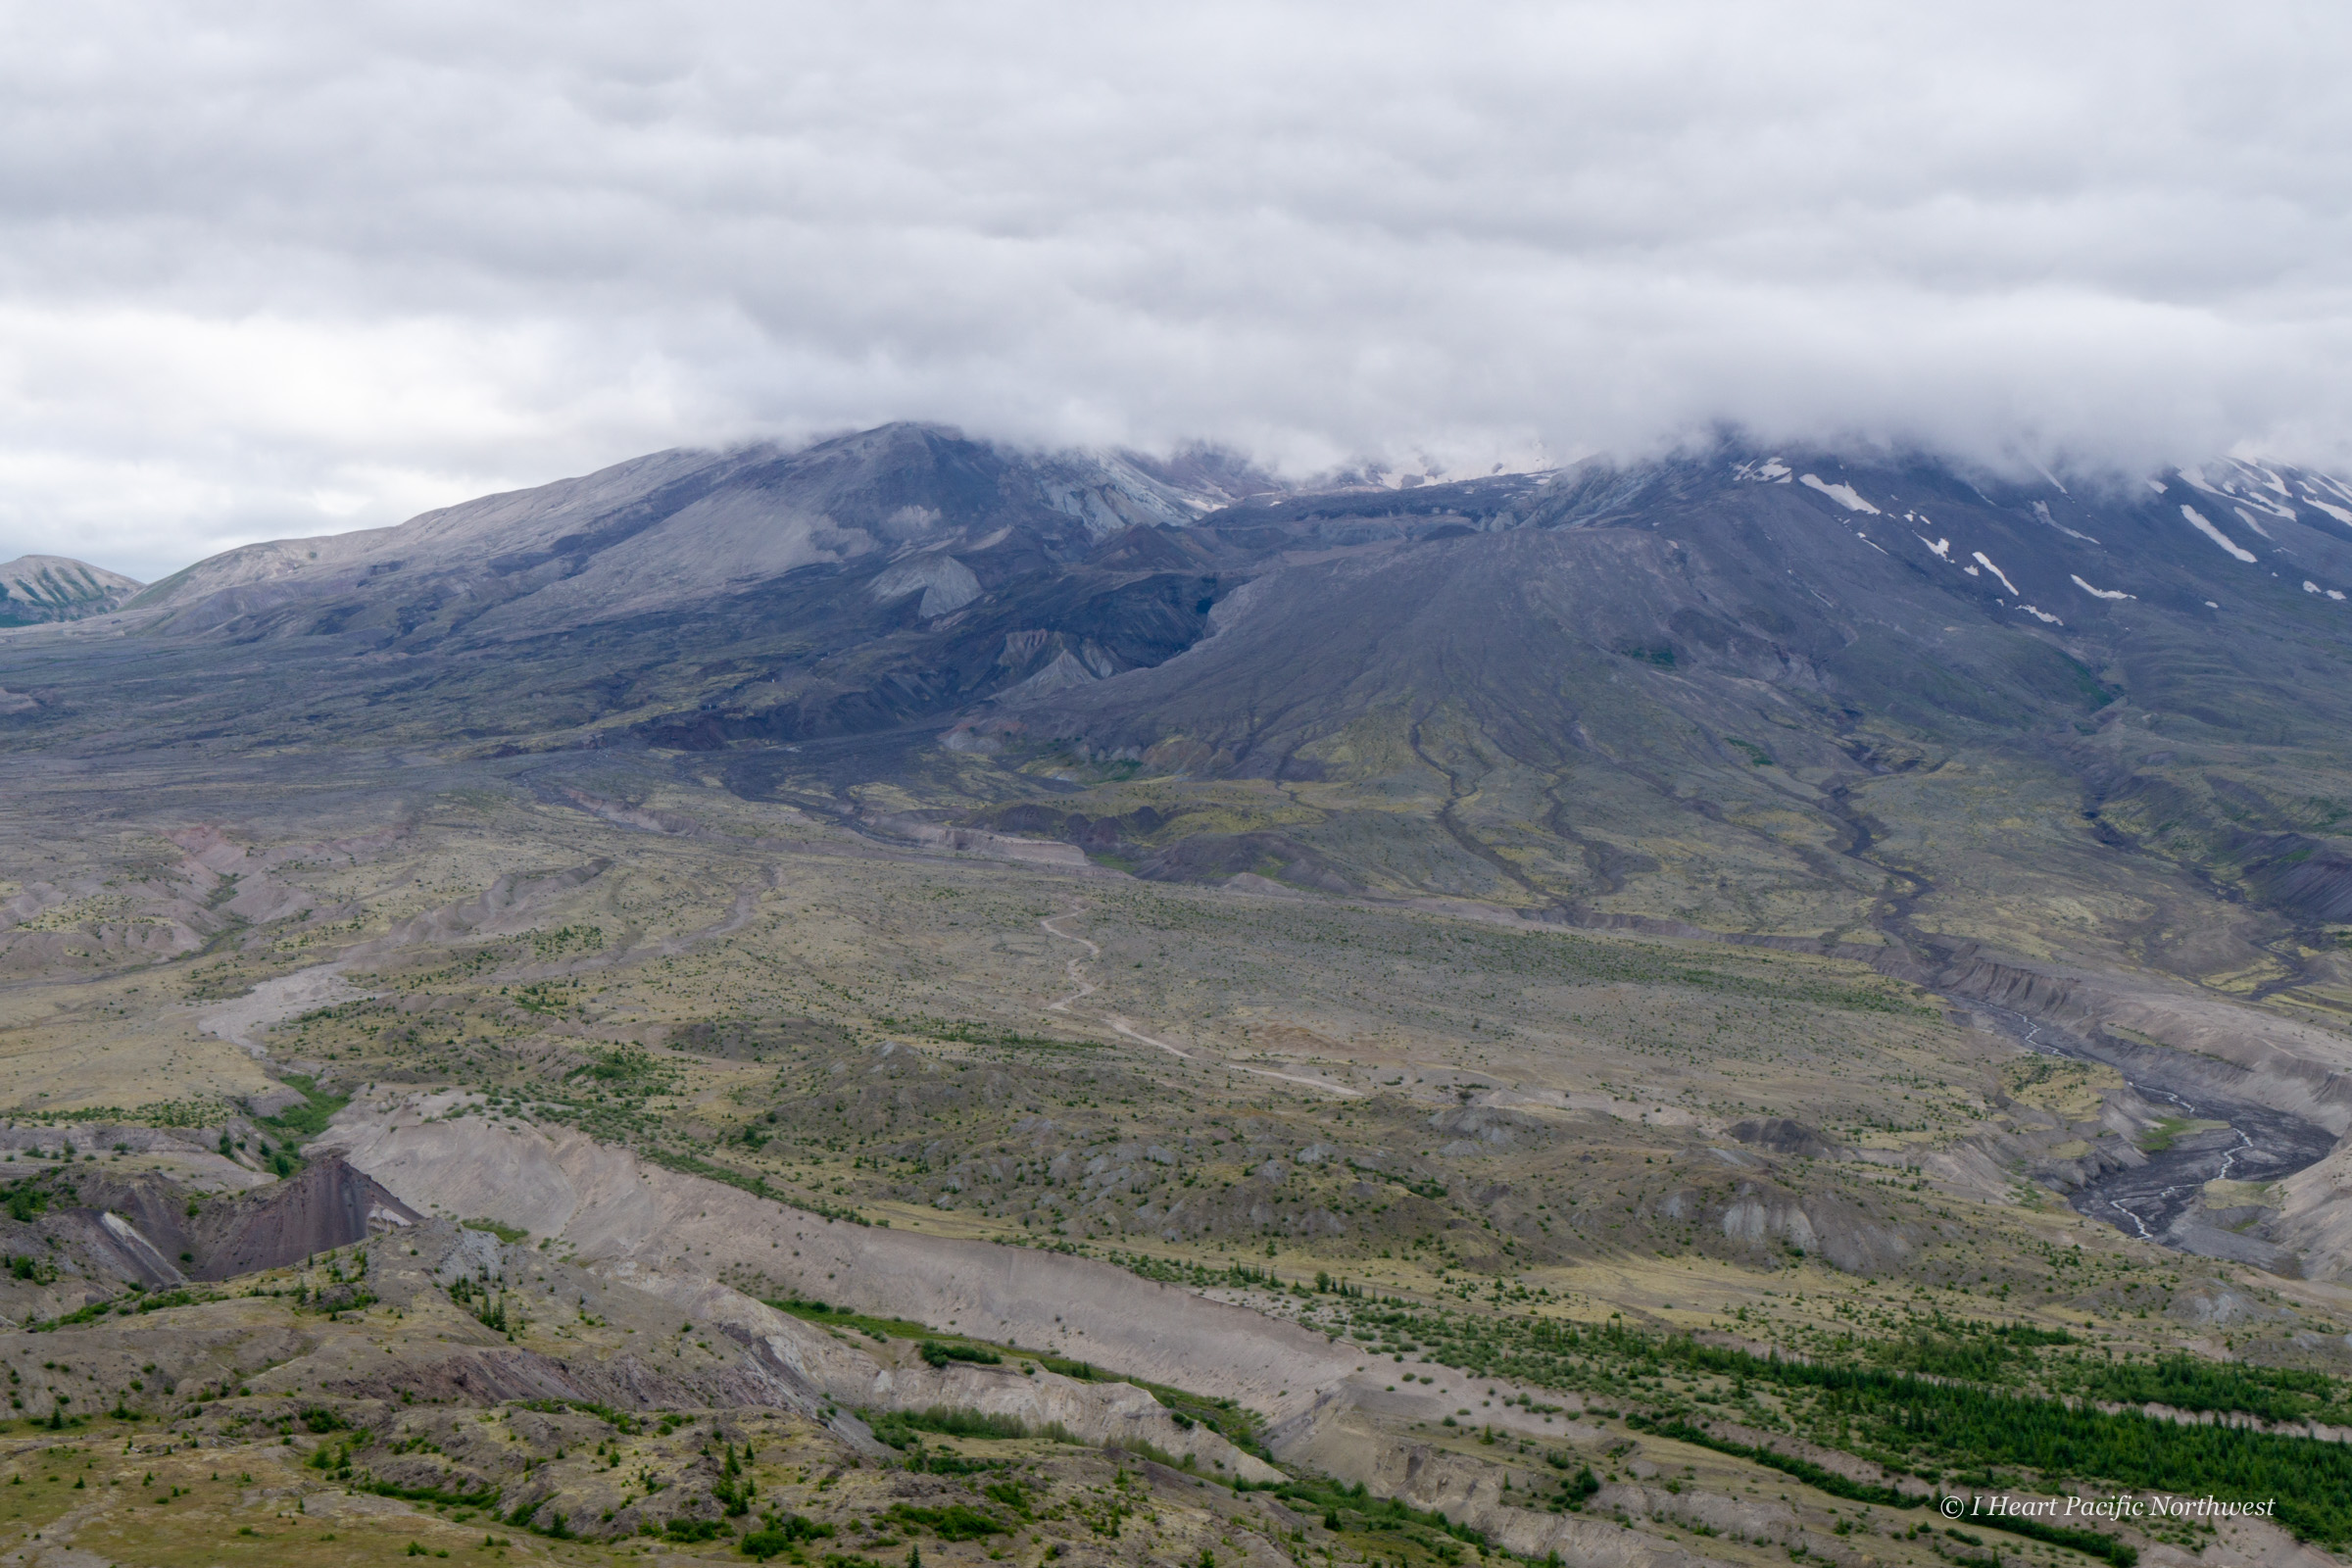 Mount St. Helens: Harry's Ridge hike